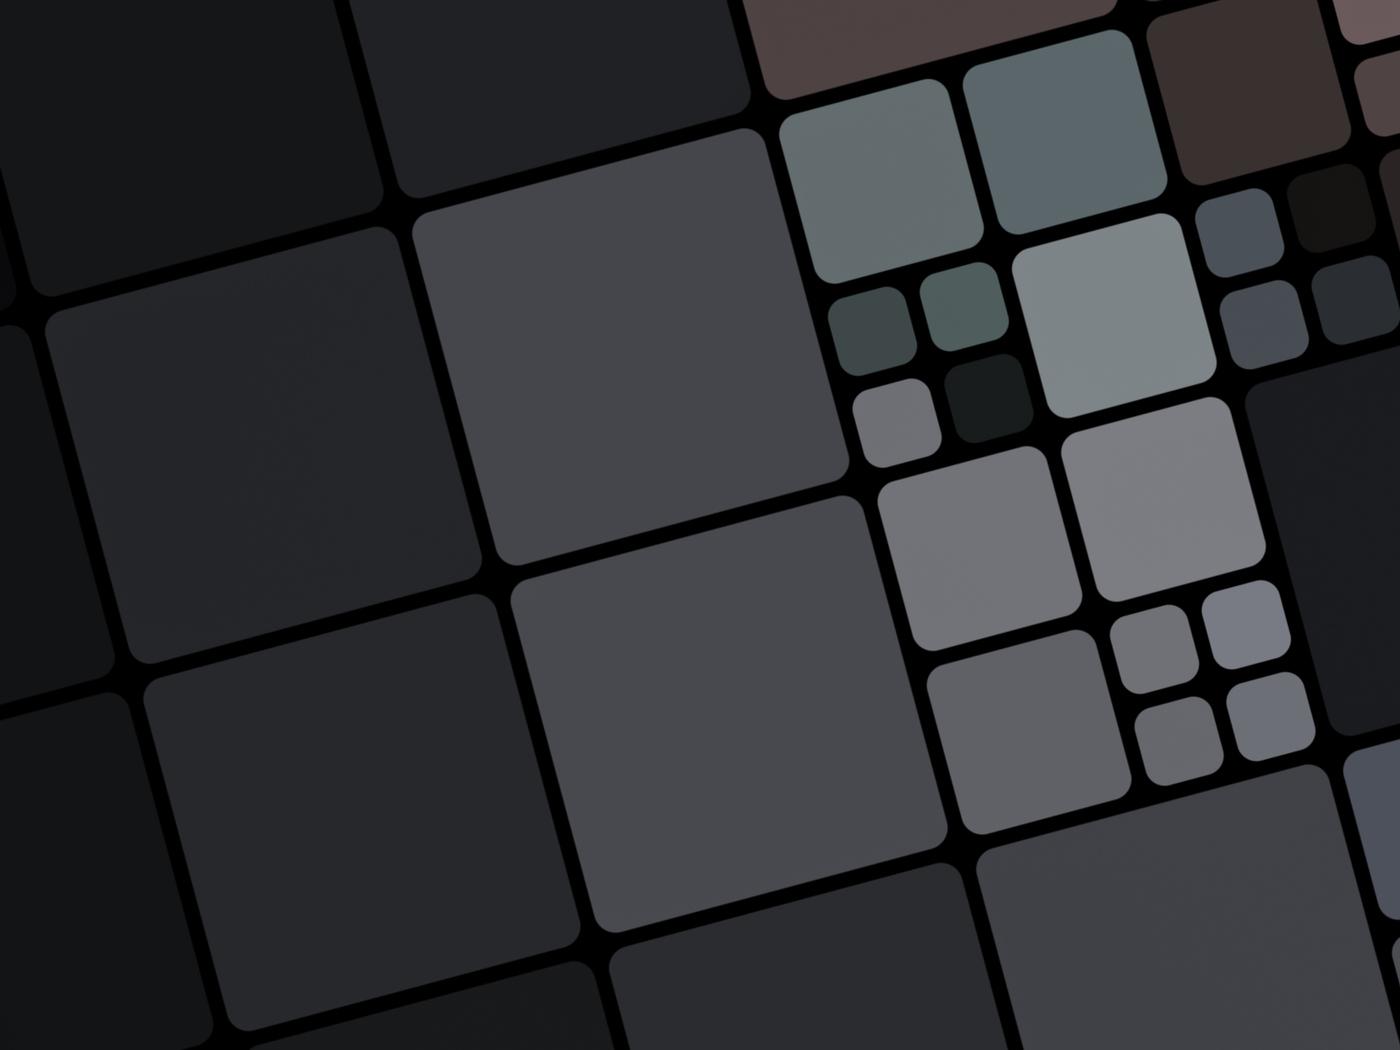 grey-cubes-8k-ct.jpg